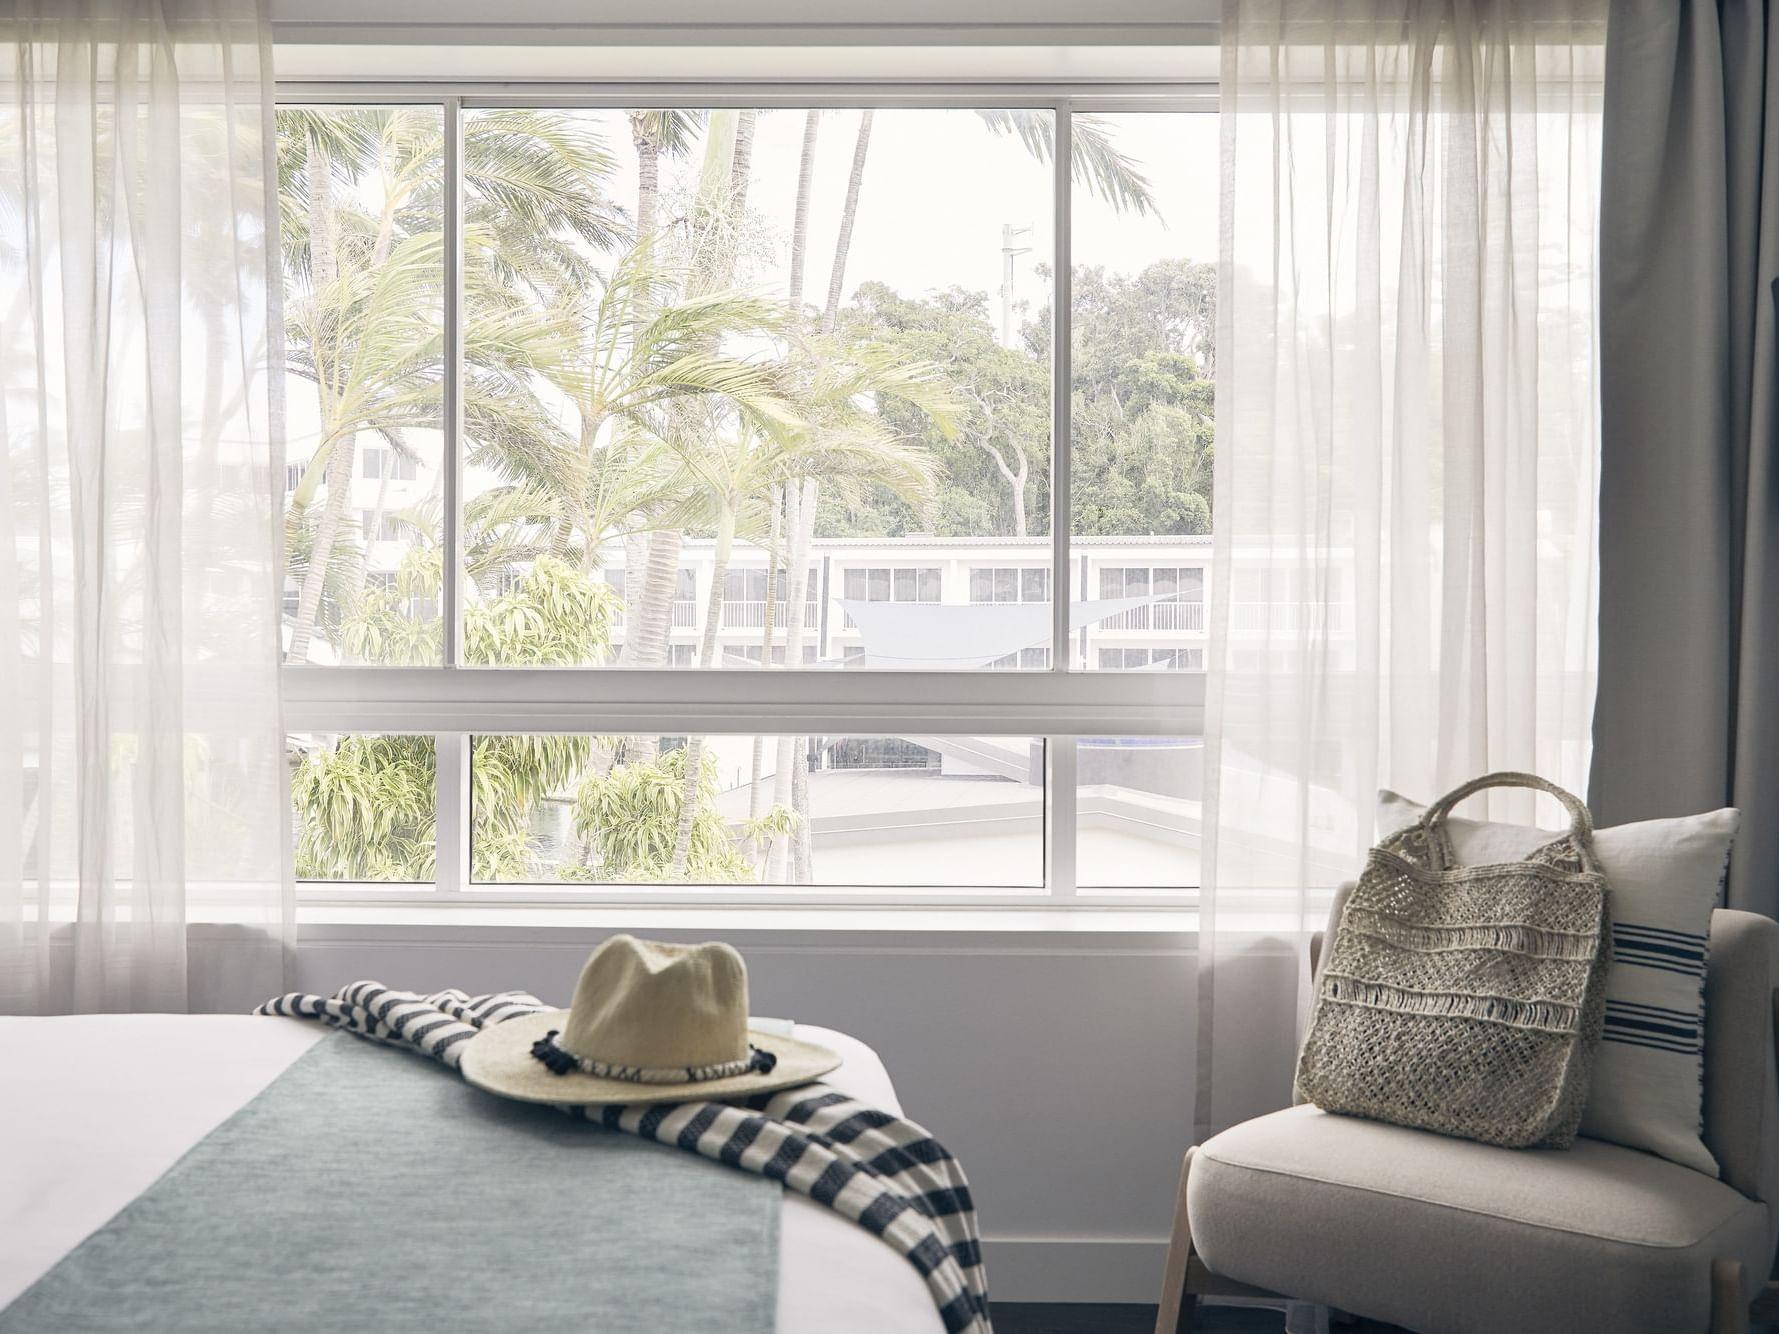 Window view from Resort Room at Daydream Island Resort